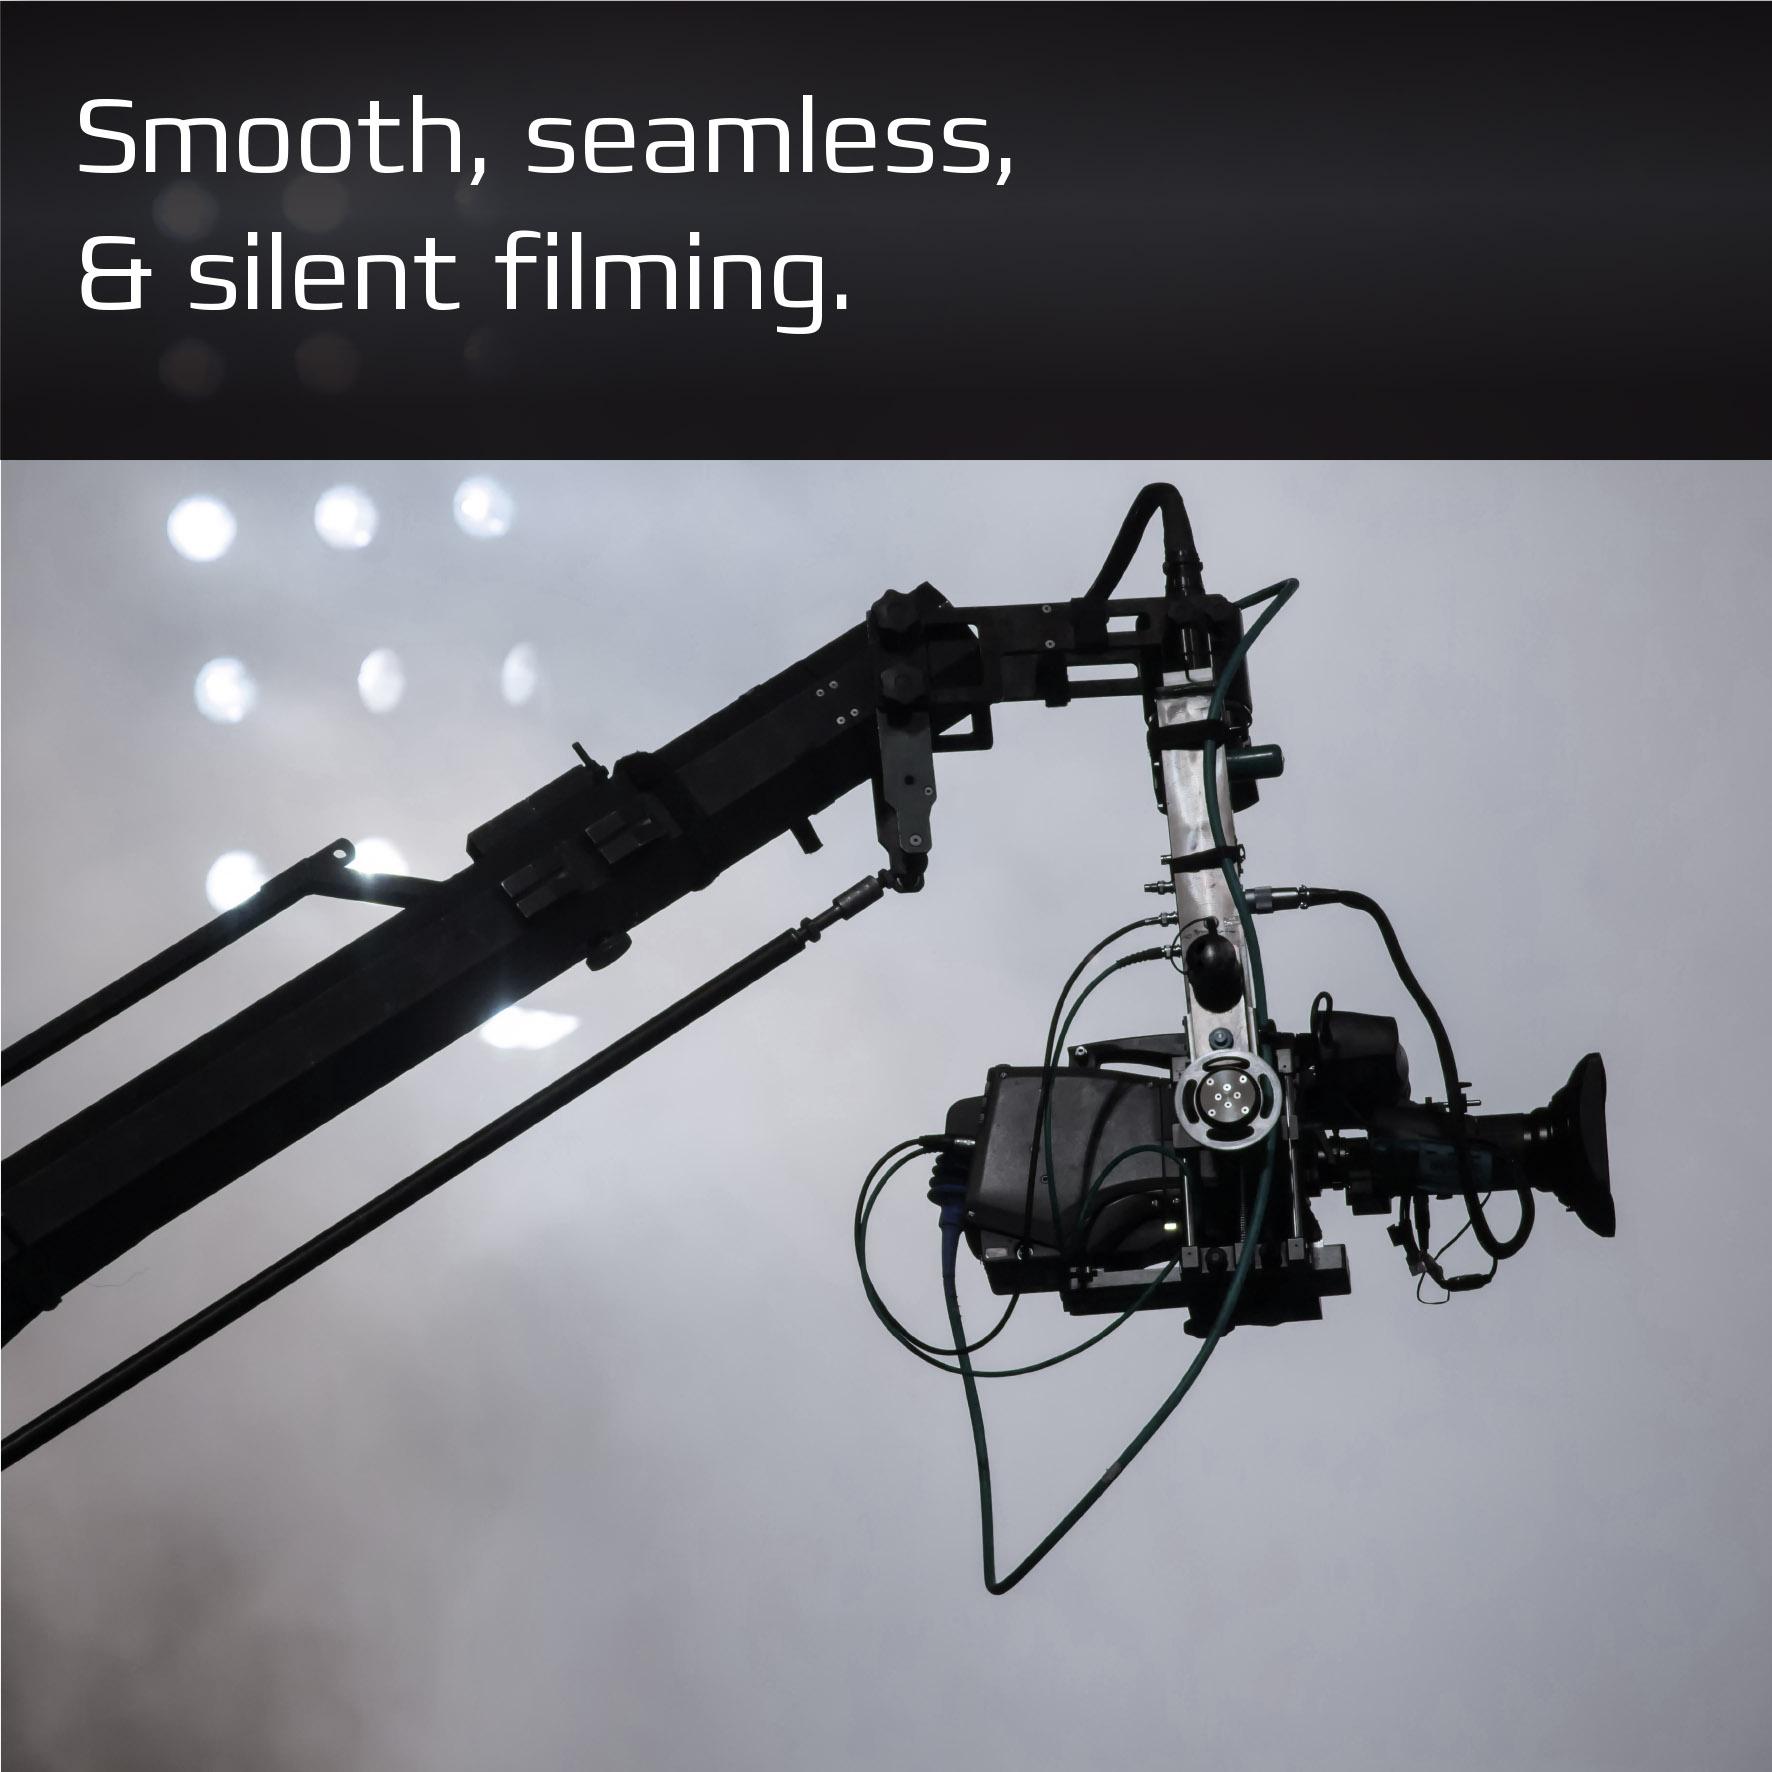 Film Camera on crane